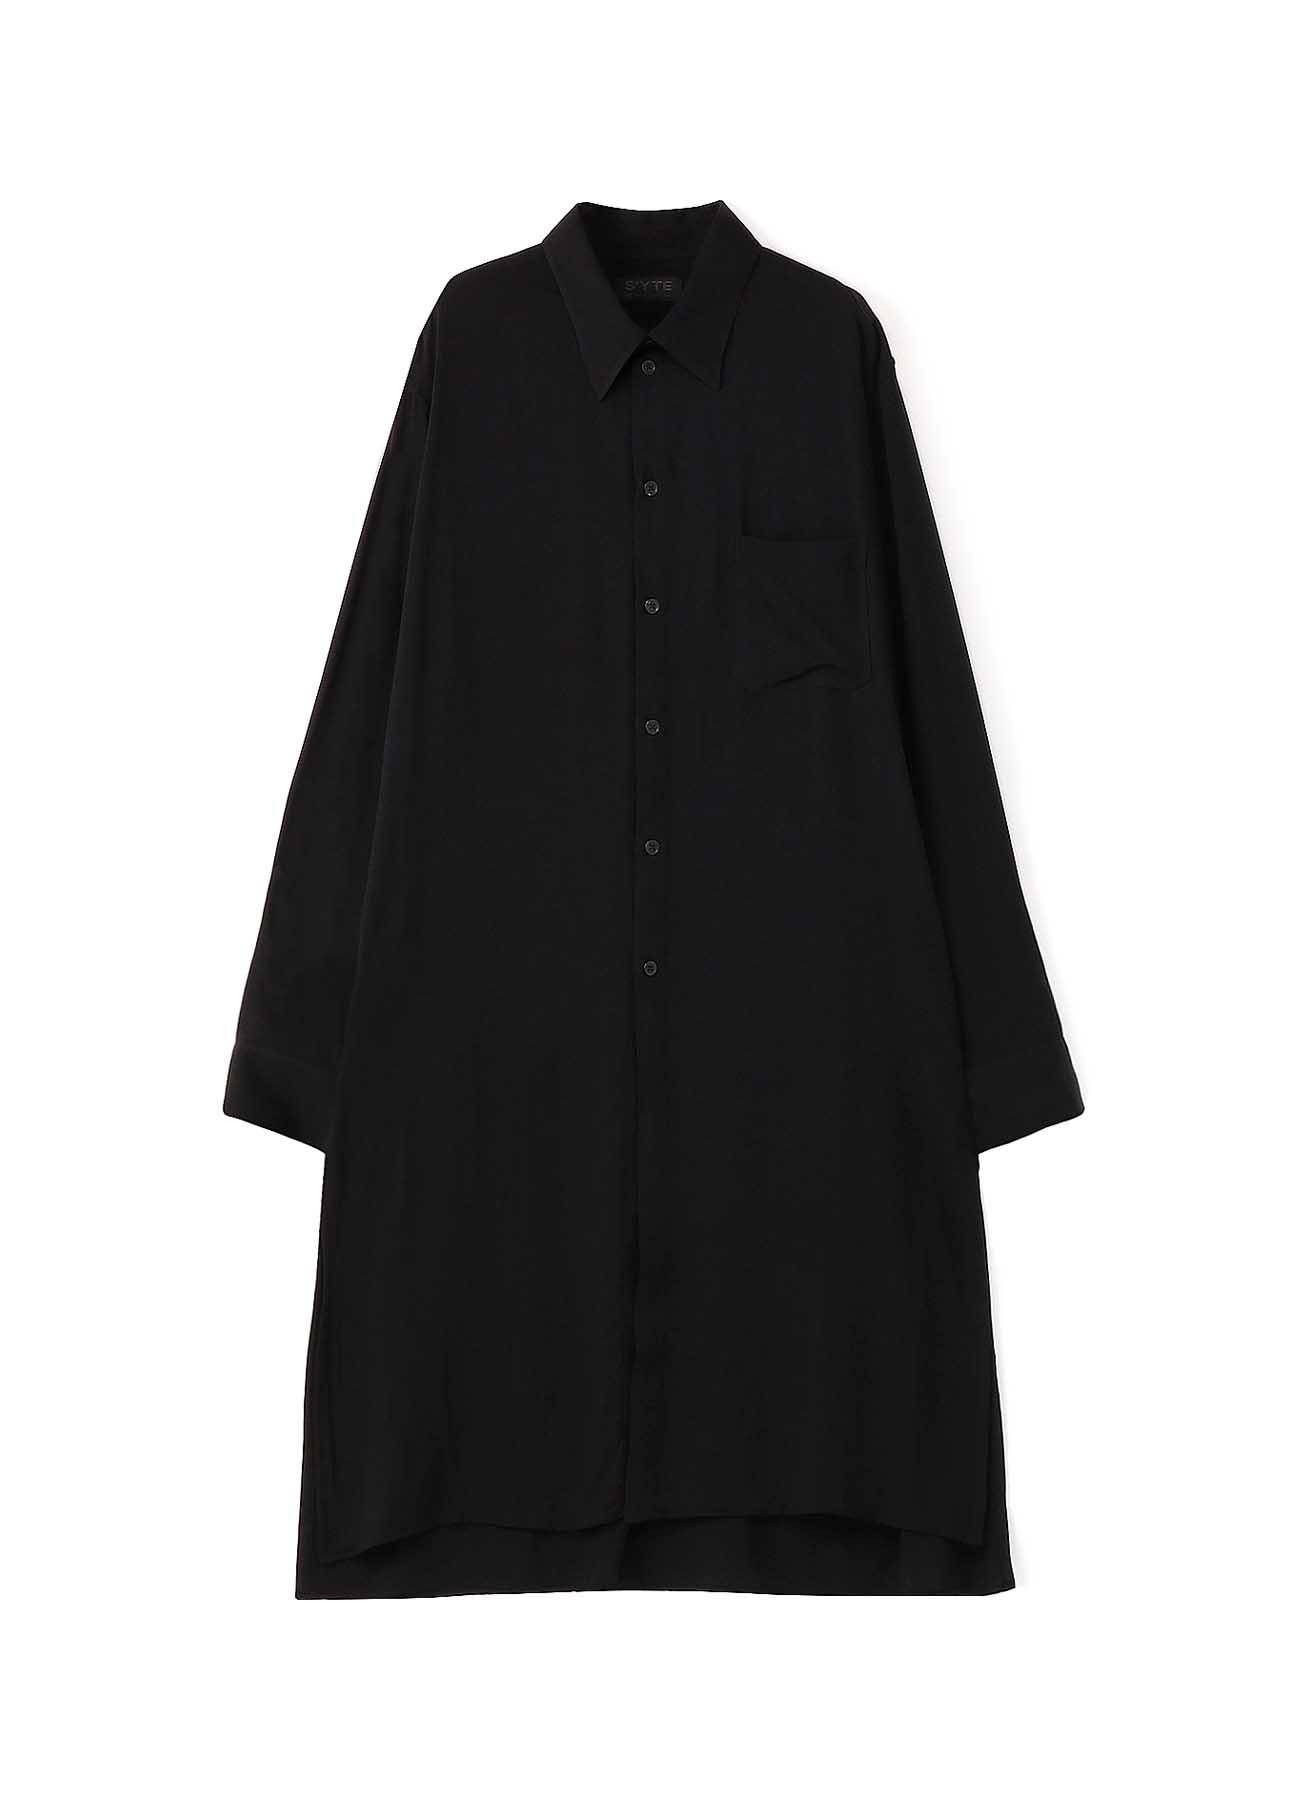 60s Ry/Span Twill Washer Regular Long Shirt